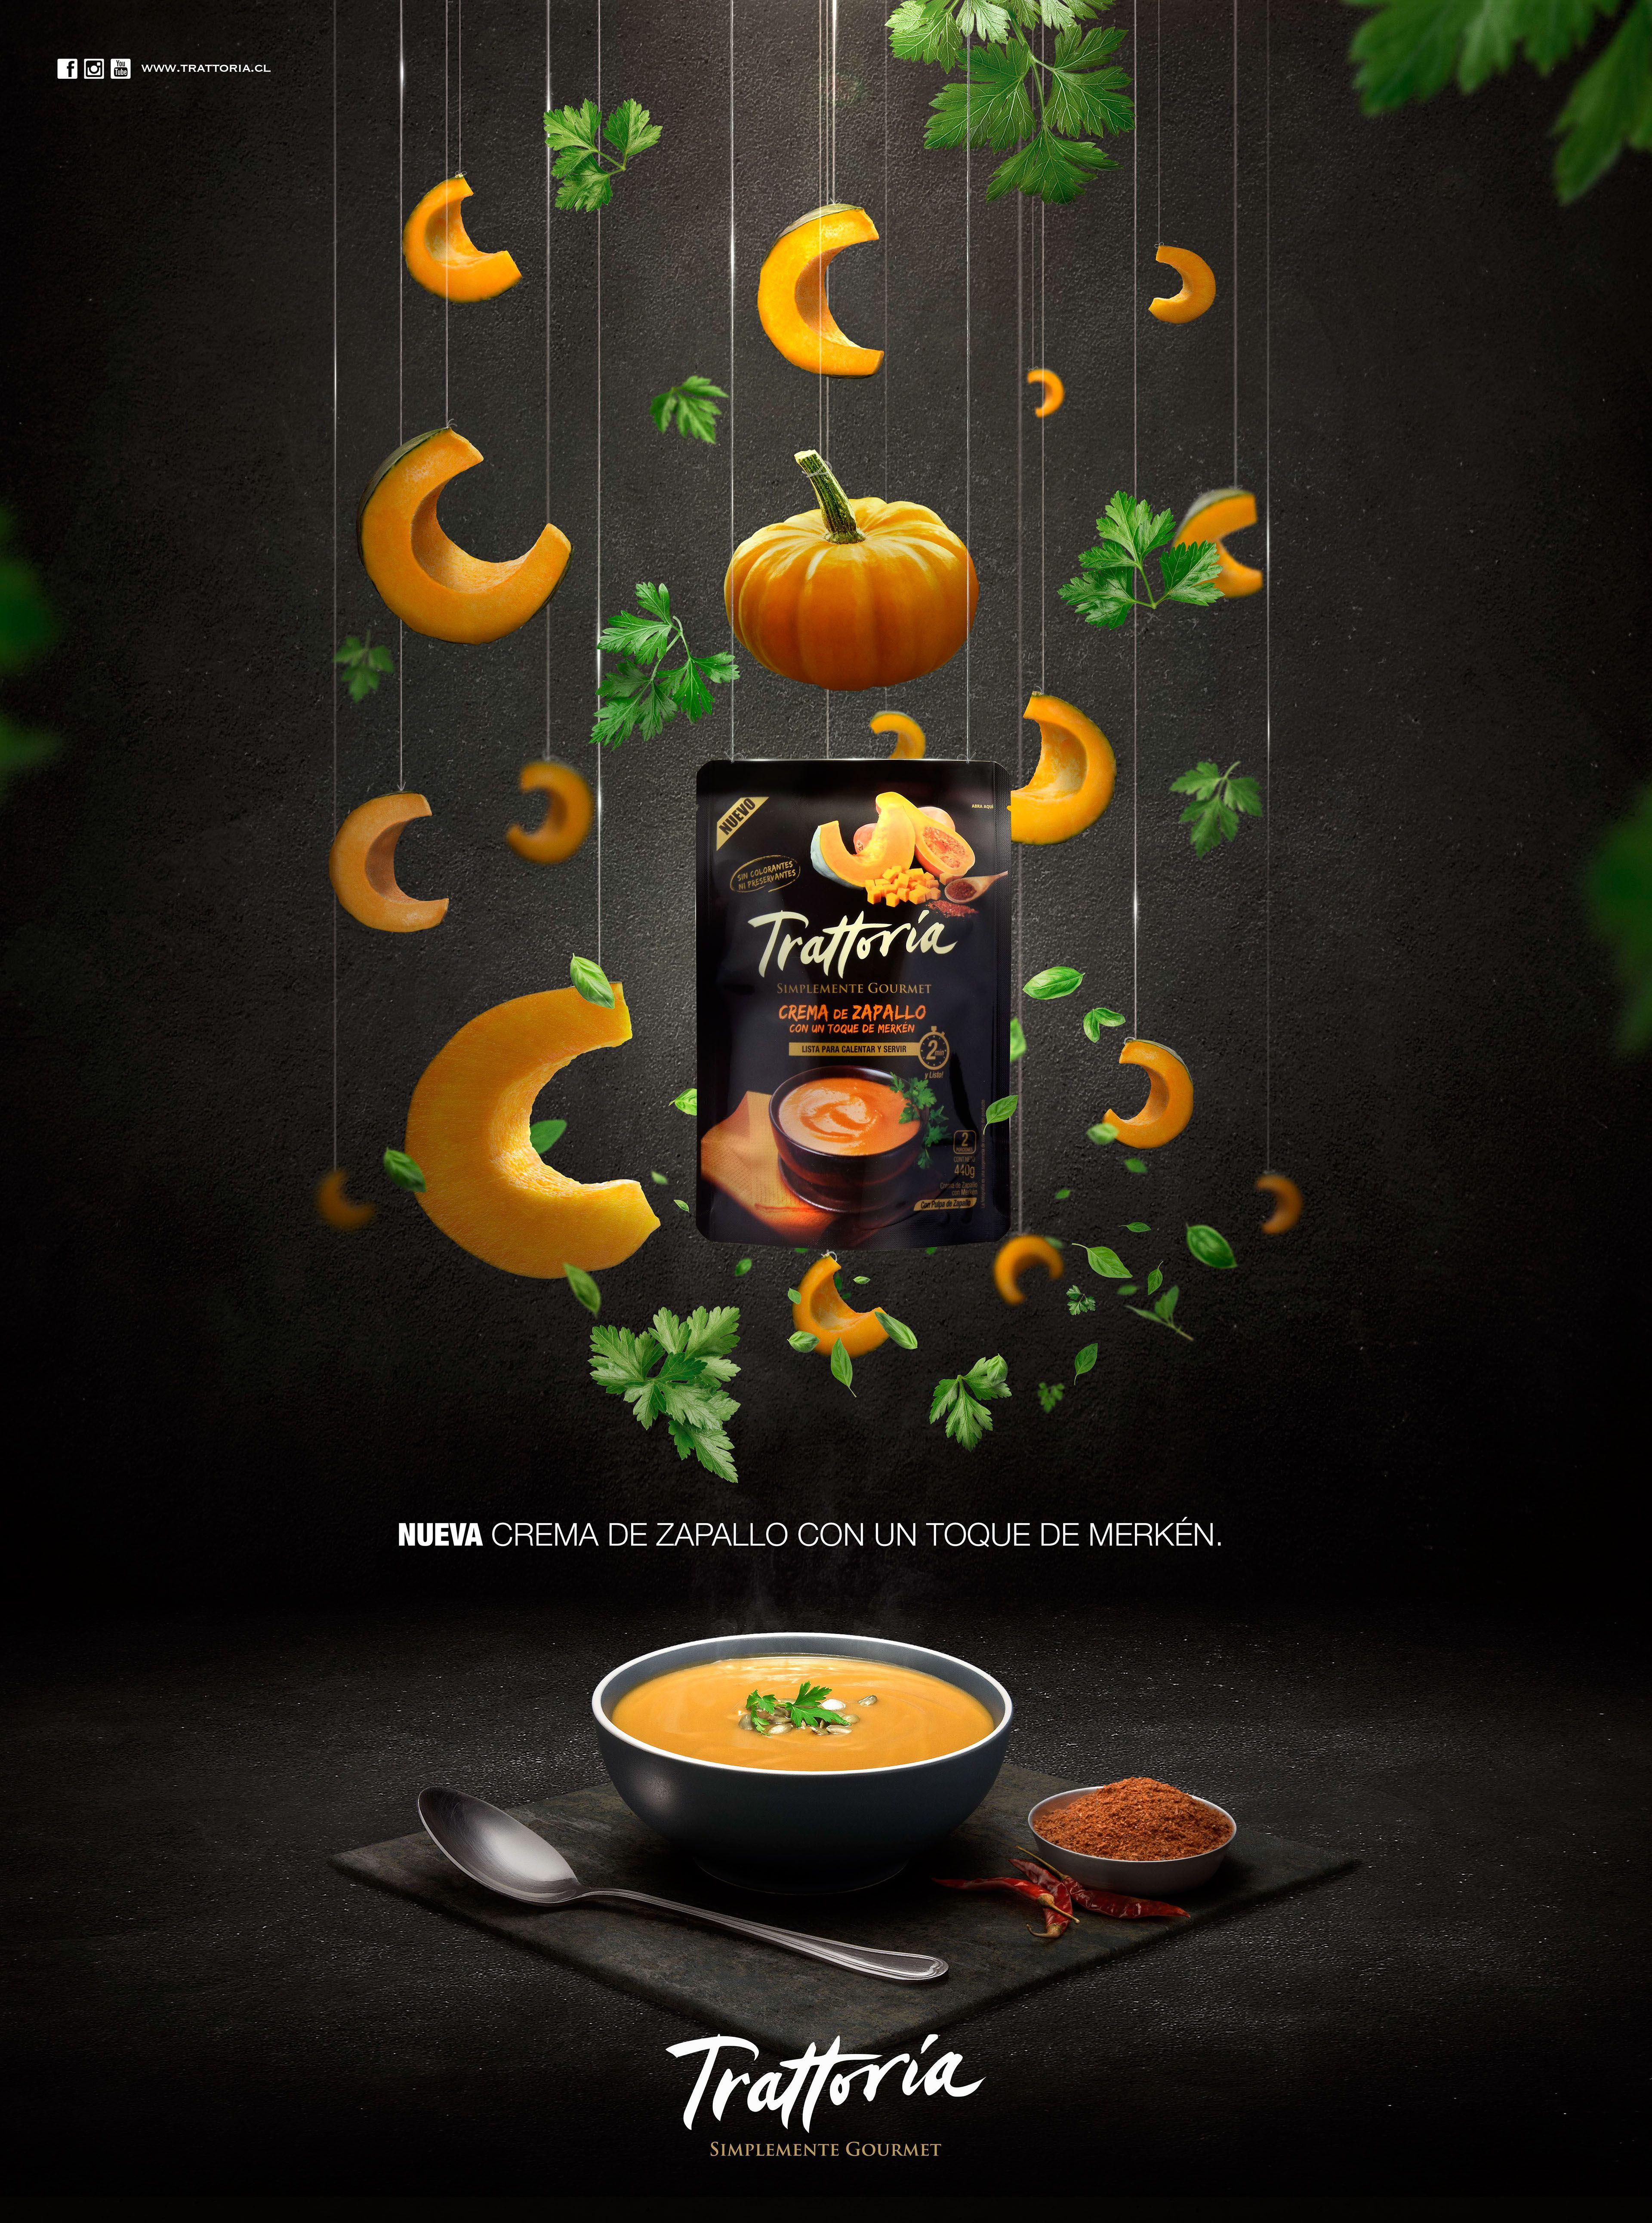 Cremas Trattoria on Behance | Food graphic design, Graphic ...